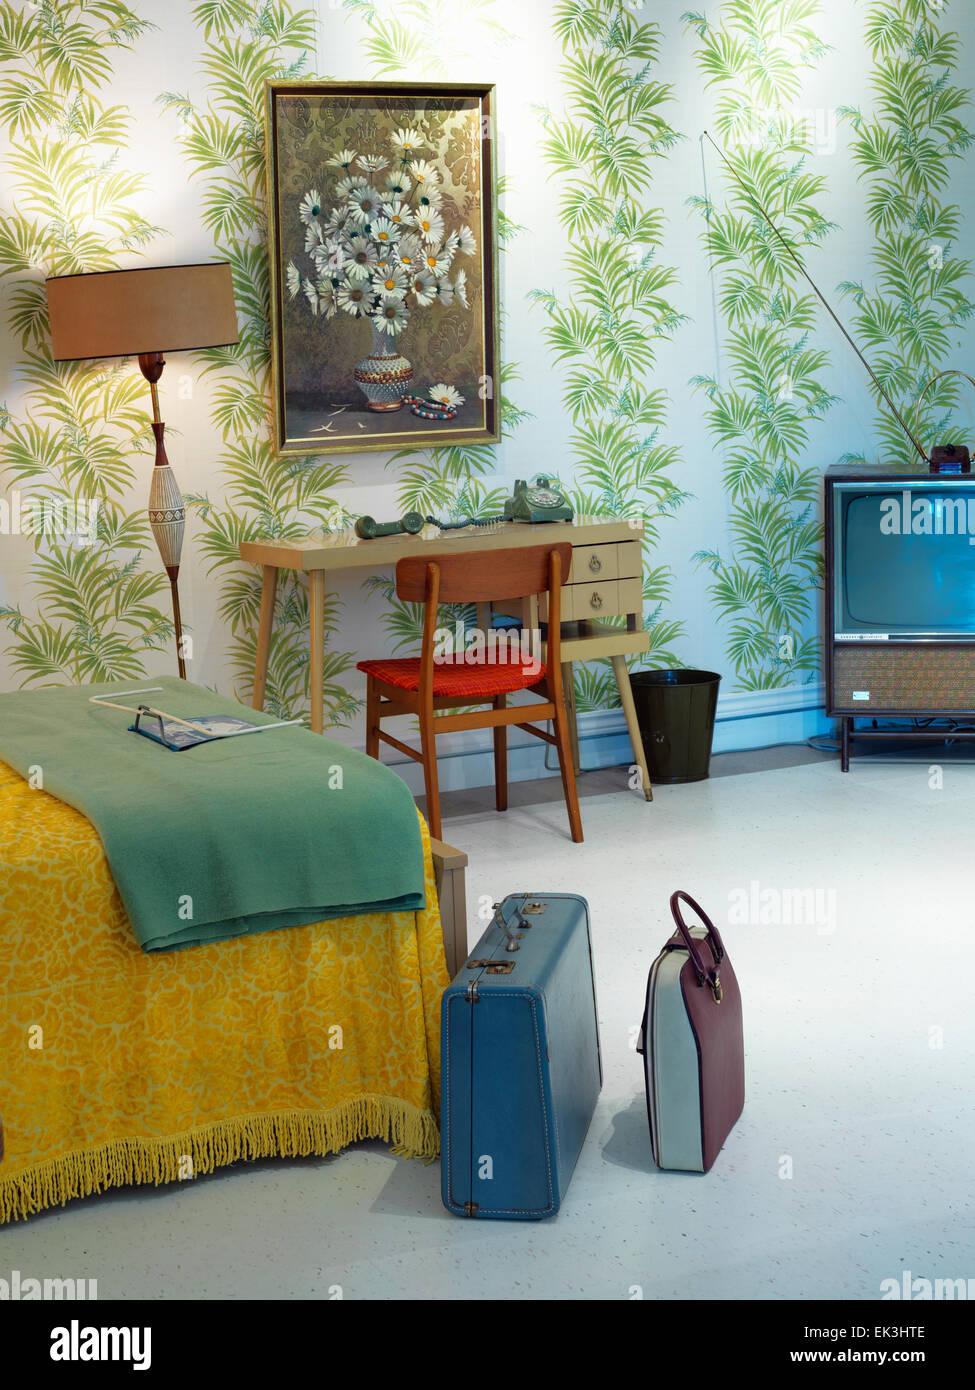 Canada,Ontario,Niagara Falls, museum display of 1960's era motel - Stock Image